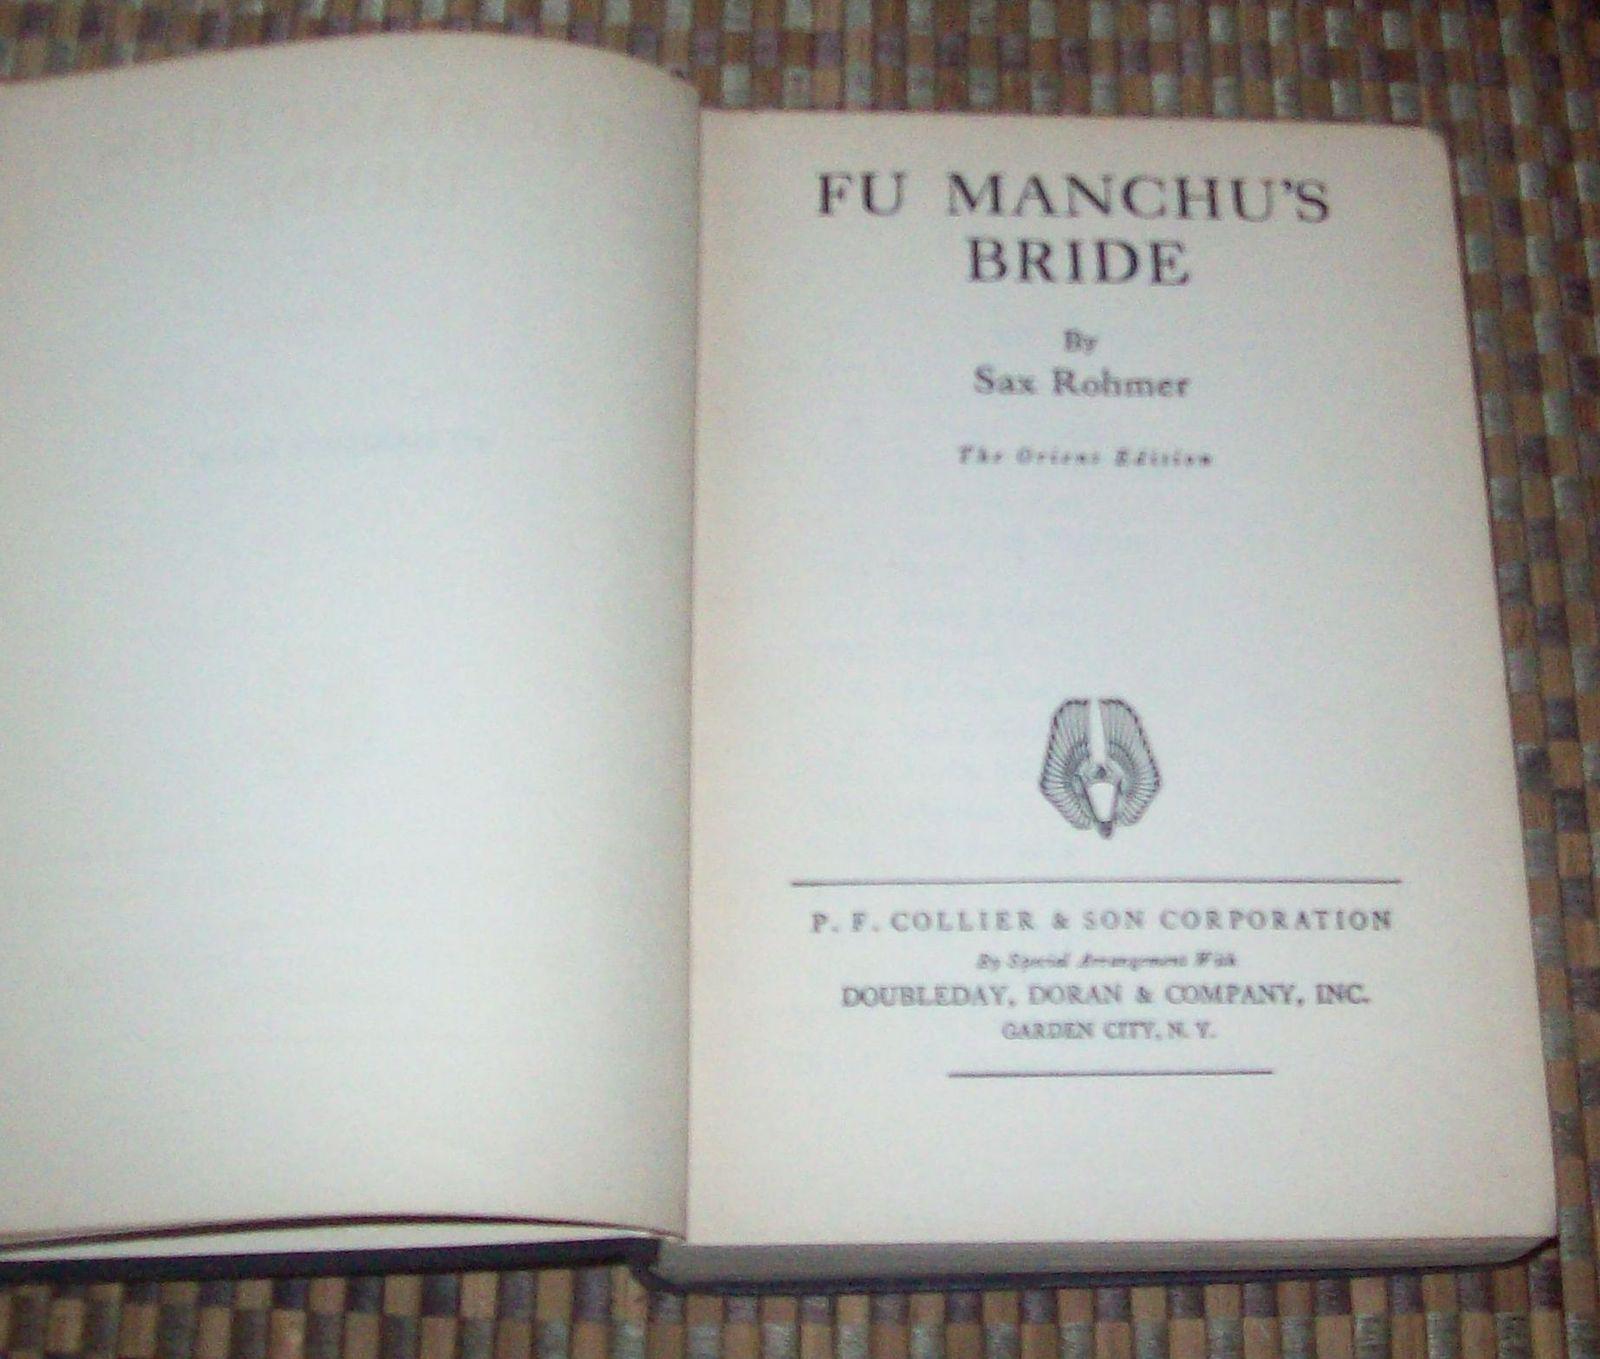 Fu Manchu's Bride by Sax Rohmer Orient Ed. 1933 HB